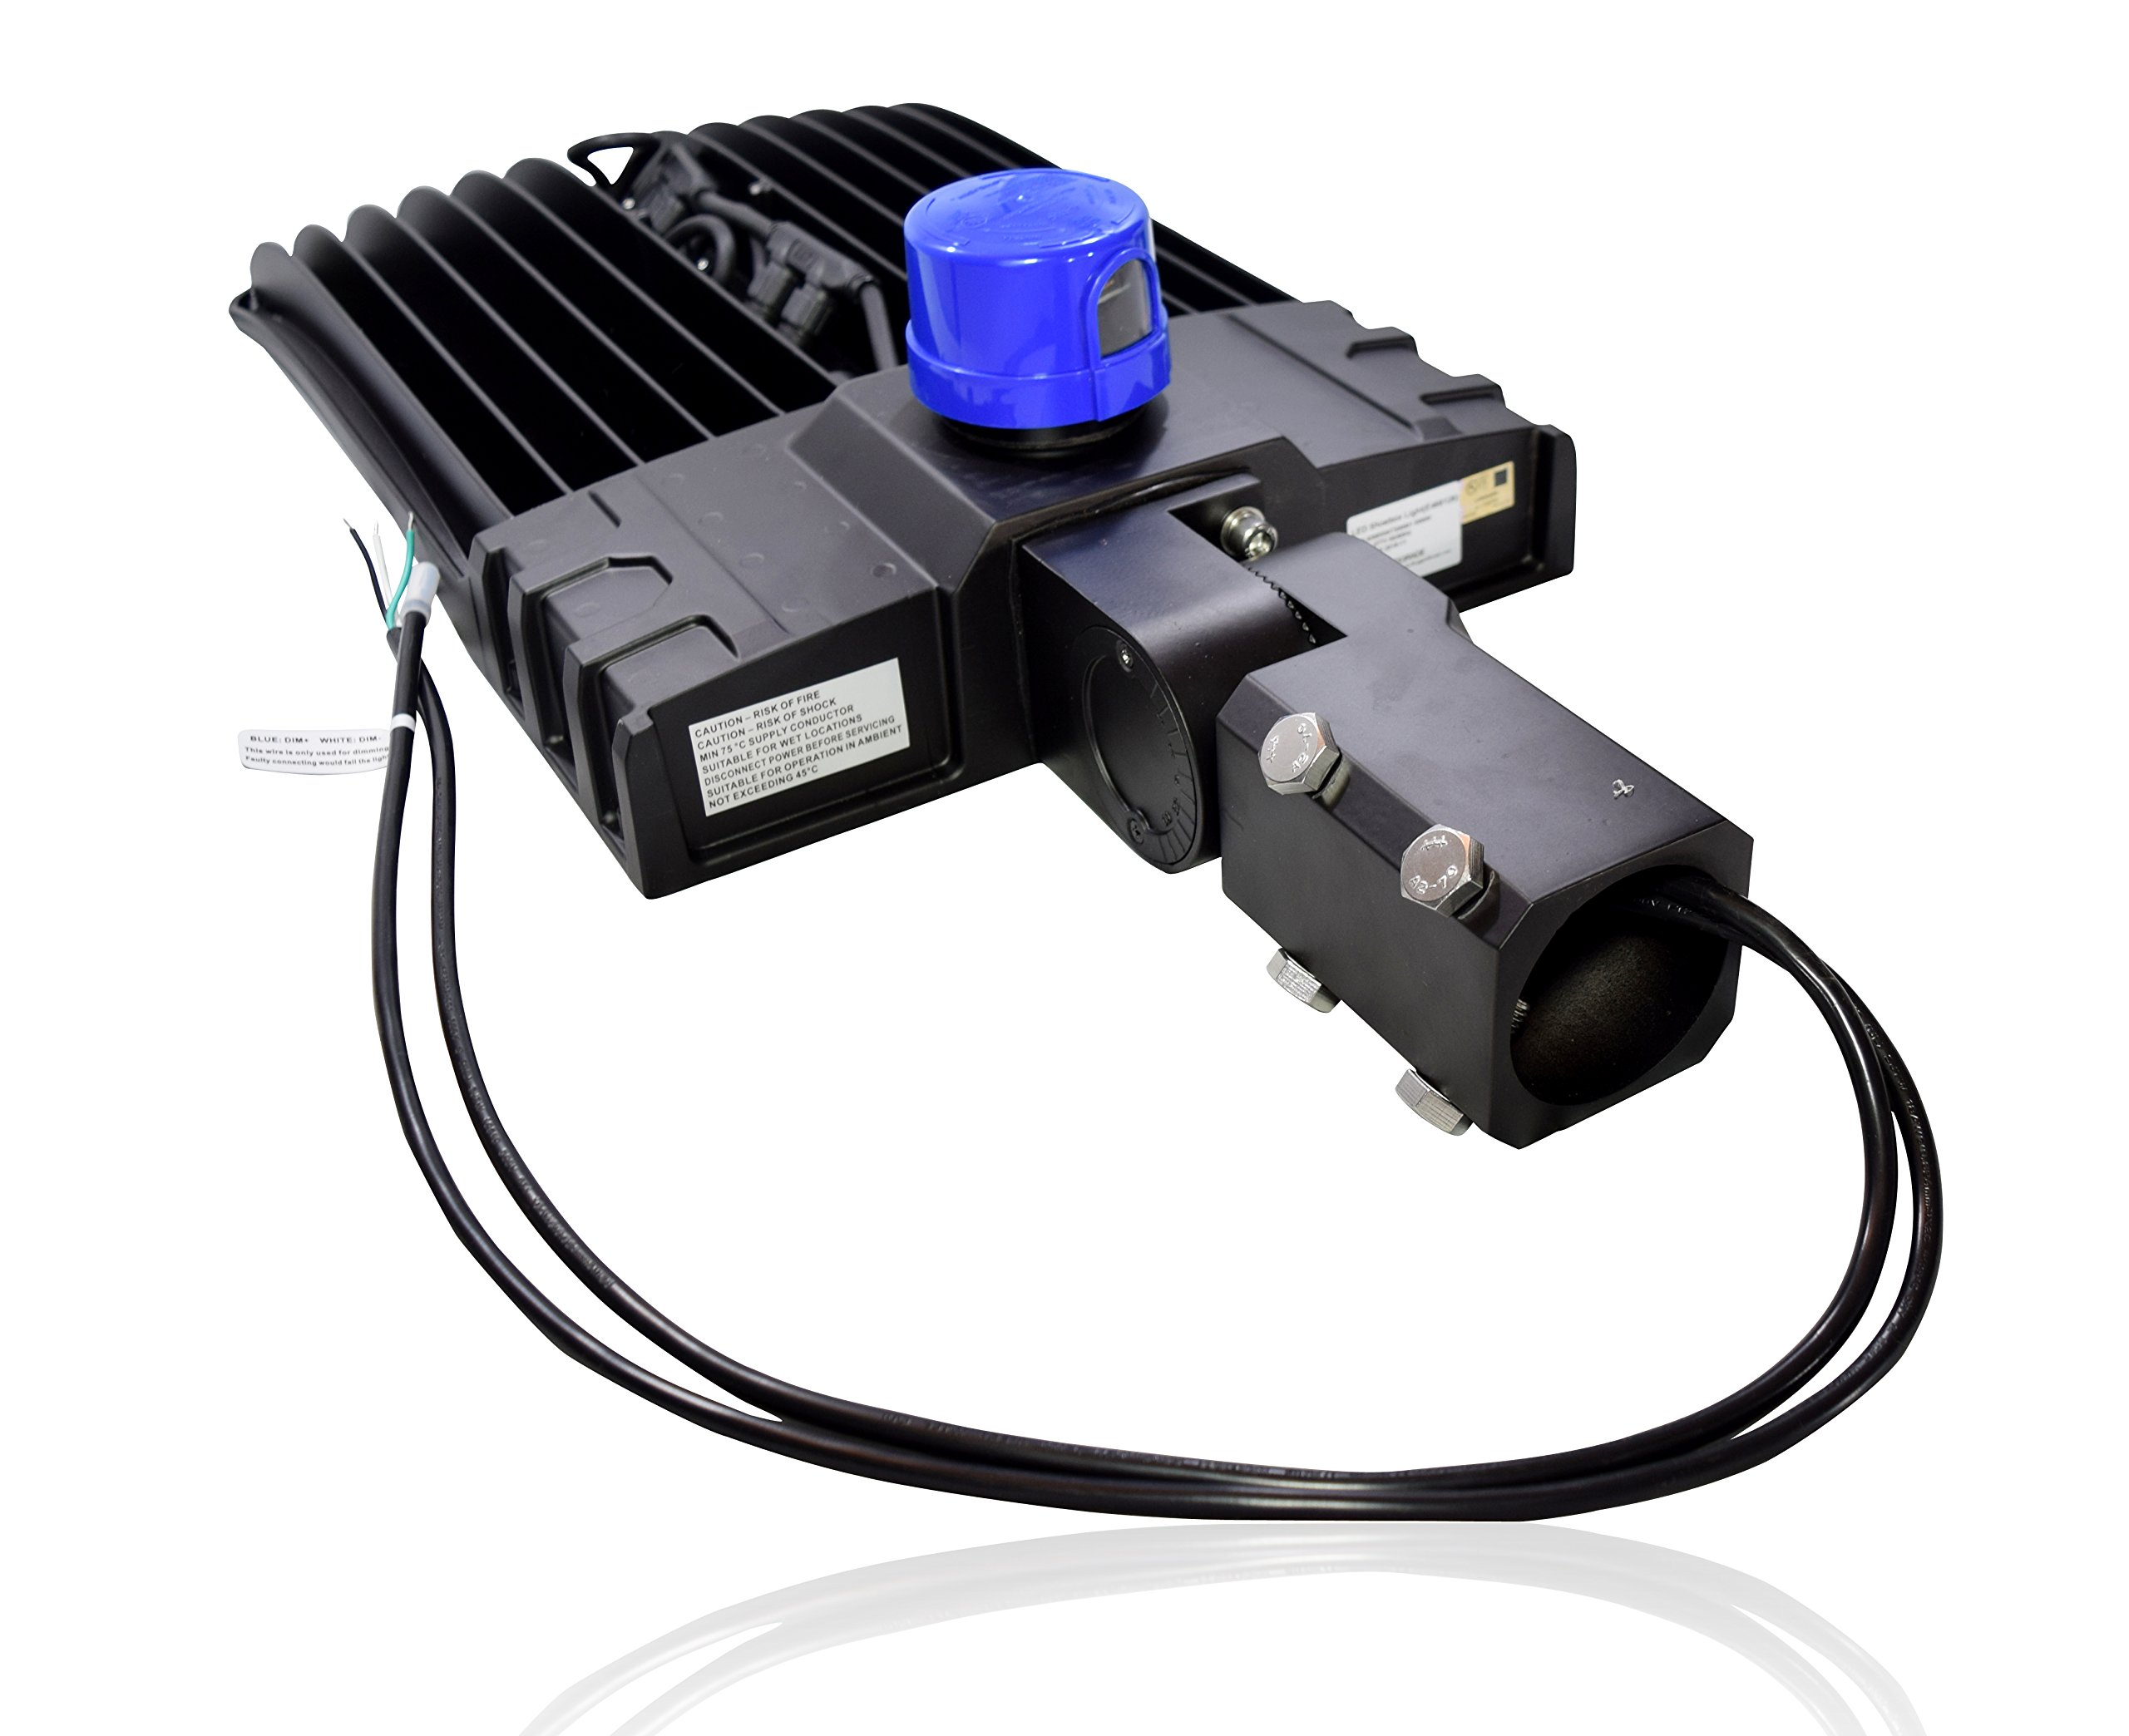 300 Watt NextGen LED Parking Lot Lights - 40,000 Lumen - Super Efficiency 130 Lumen to Watt - 5000K Bright White - Replaces 1000W Halide - LED Shoebox Lights - Slip Fit Mount - With photocell by RuggedGrade (Image #7)